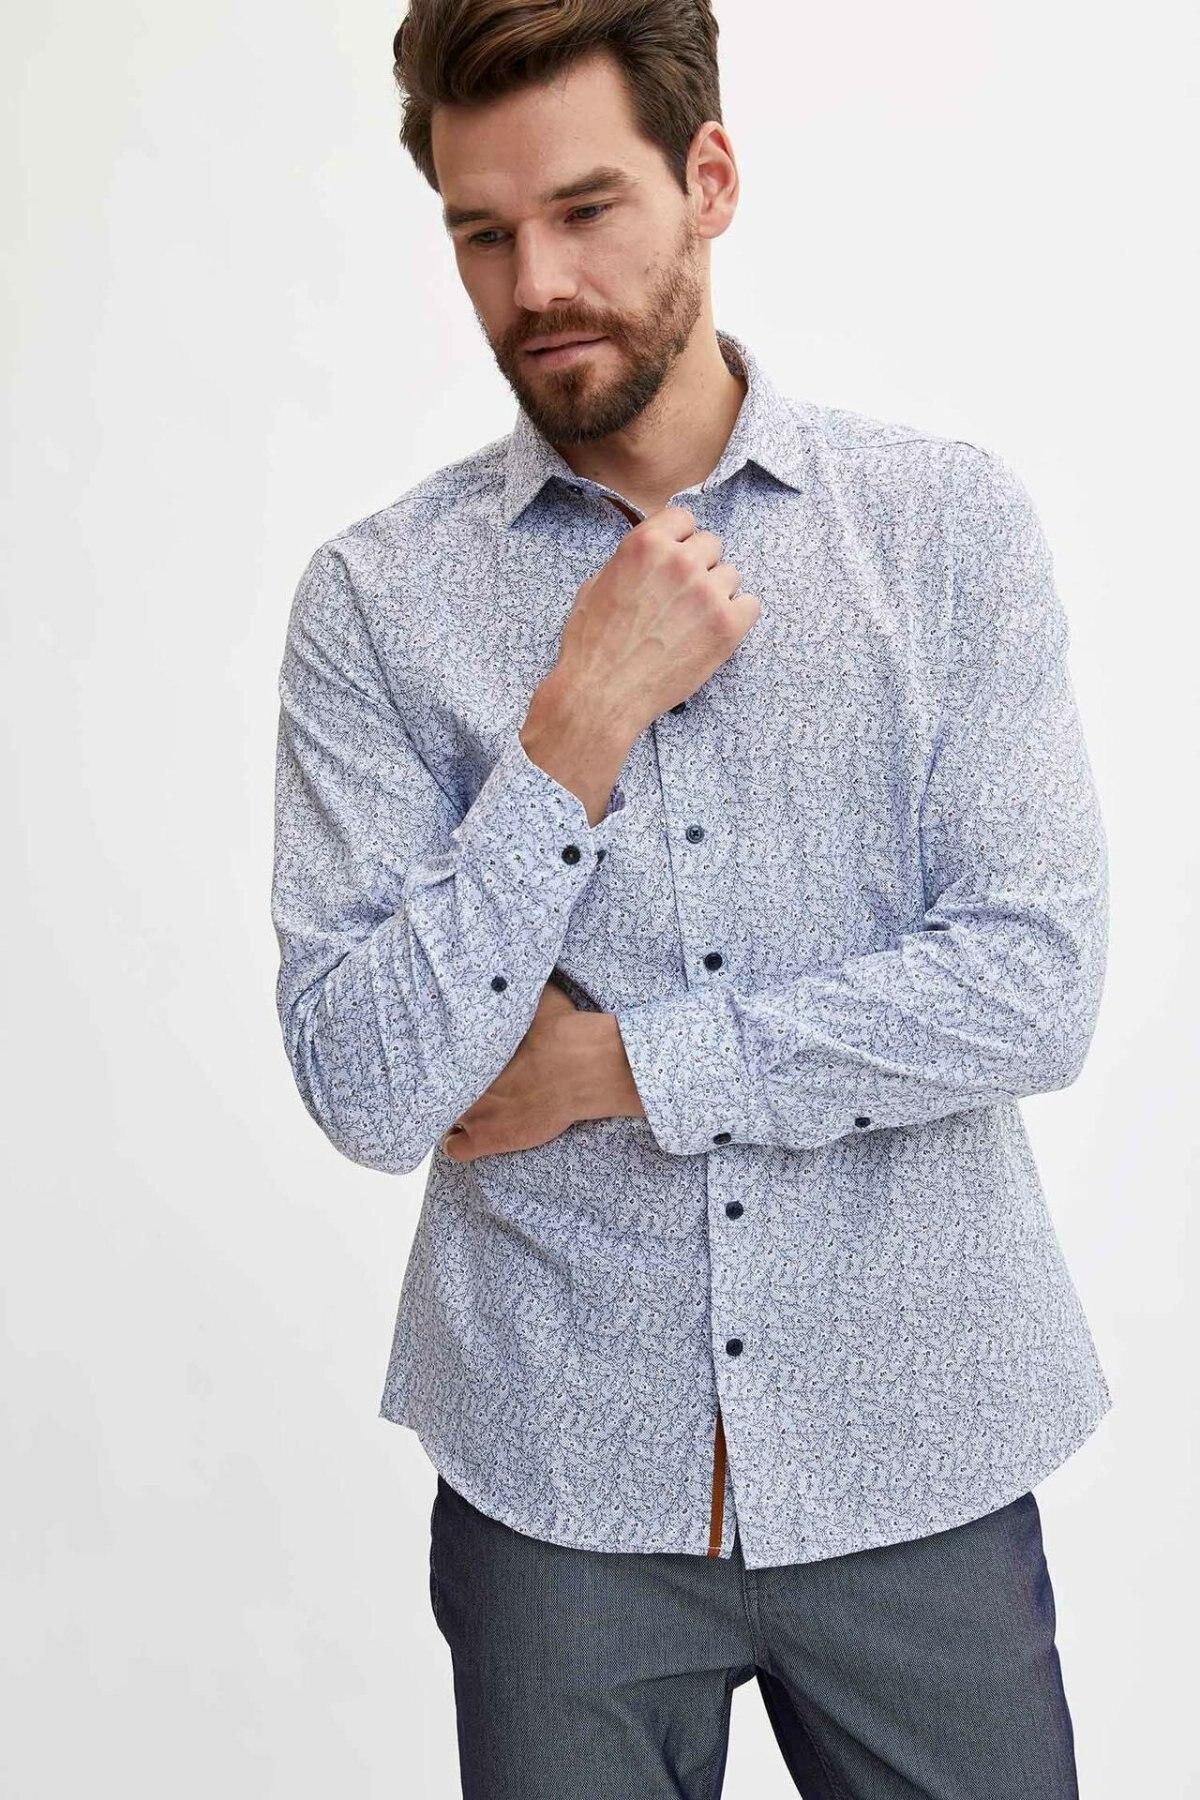 DeFacto Men Simple Pattern Shirts Short Sleeve Fashion Shirts Men Casual Lapel Collar Cotton Shirt - L5824AZ19AU